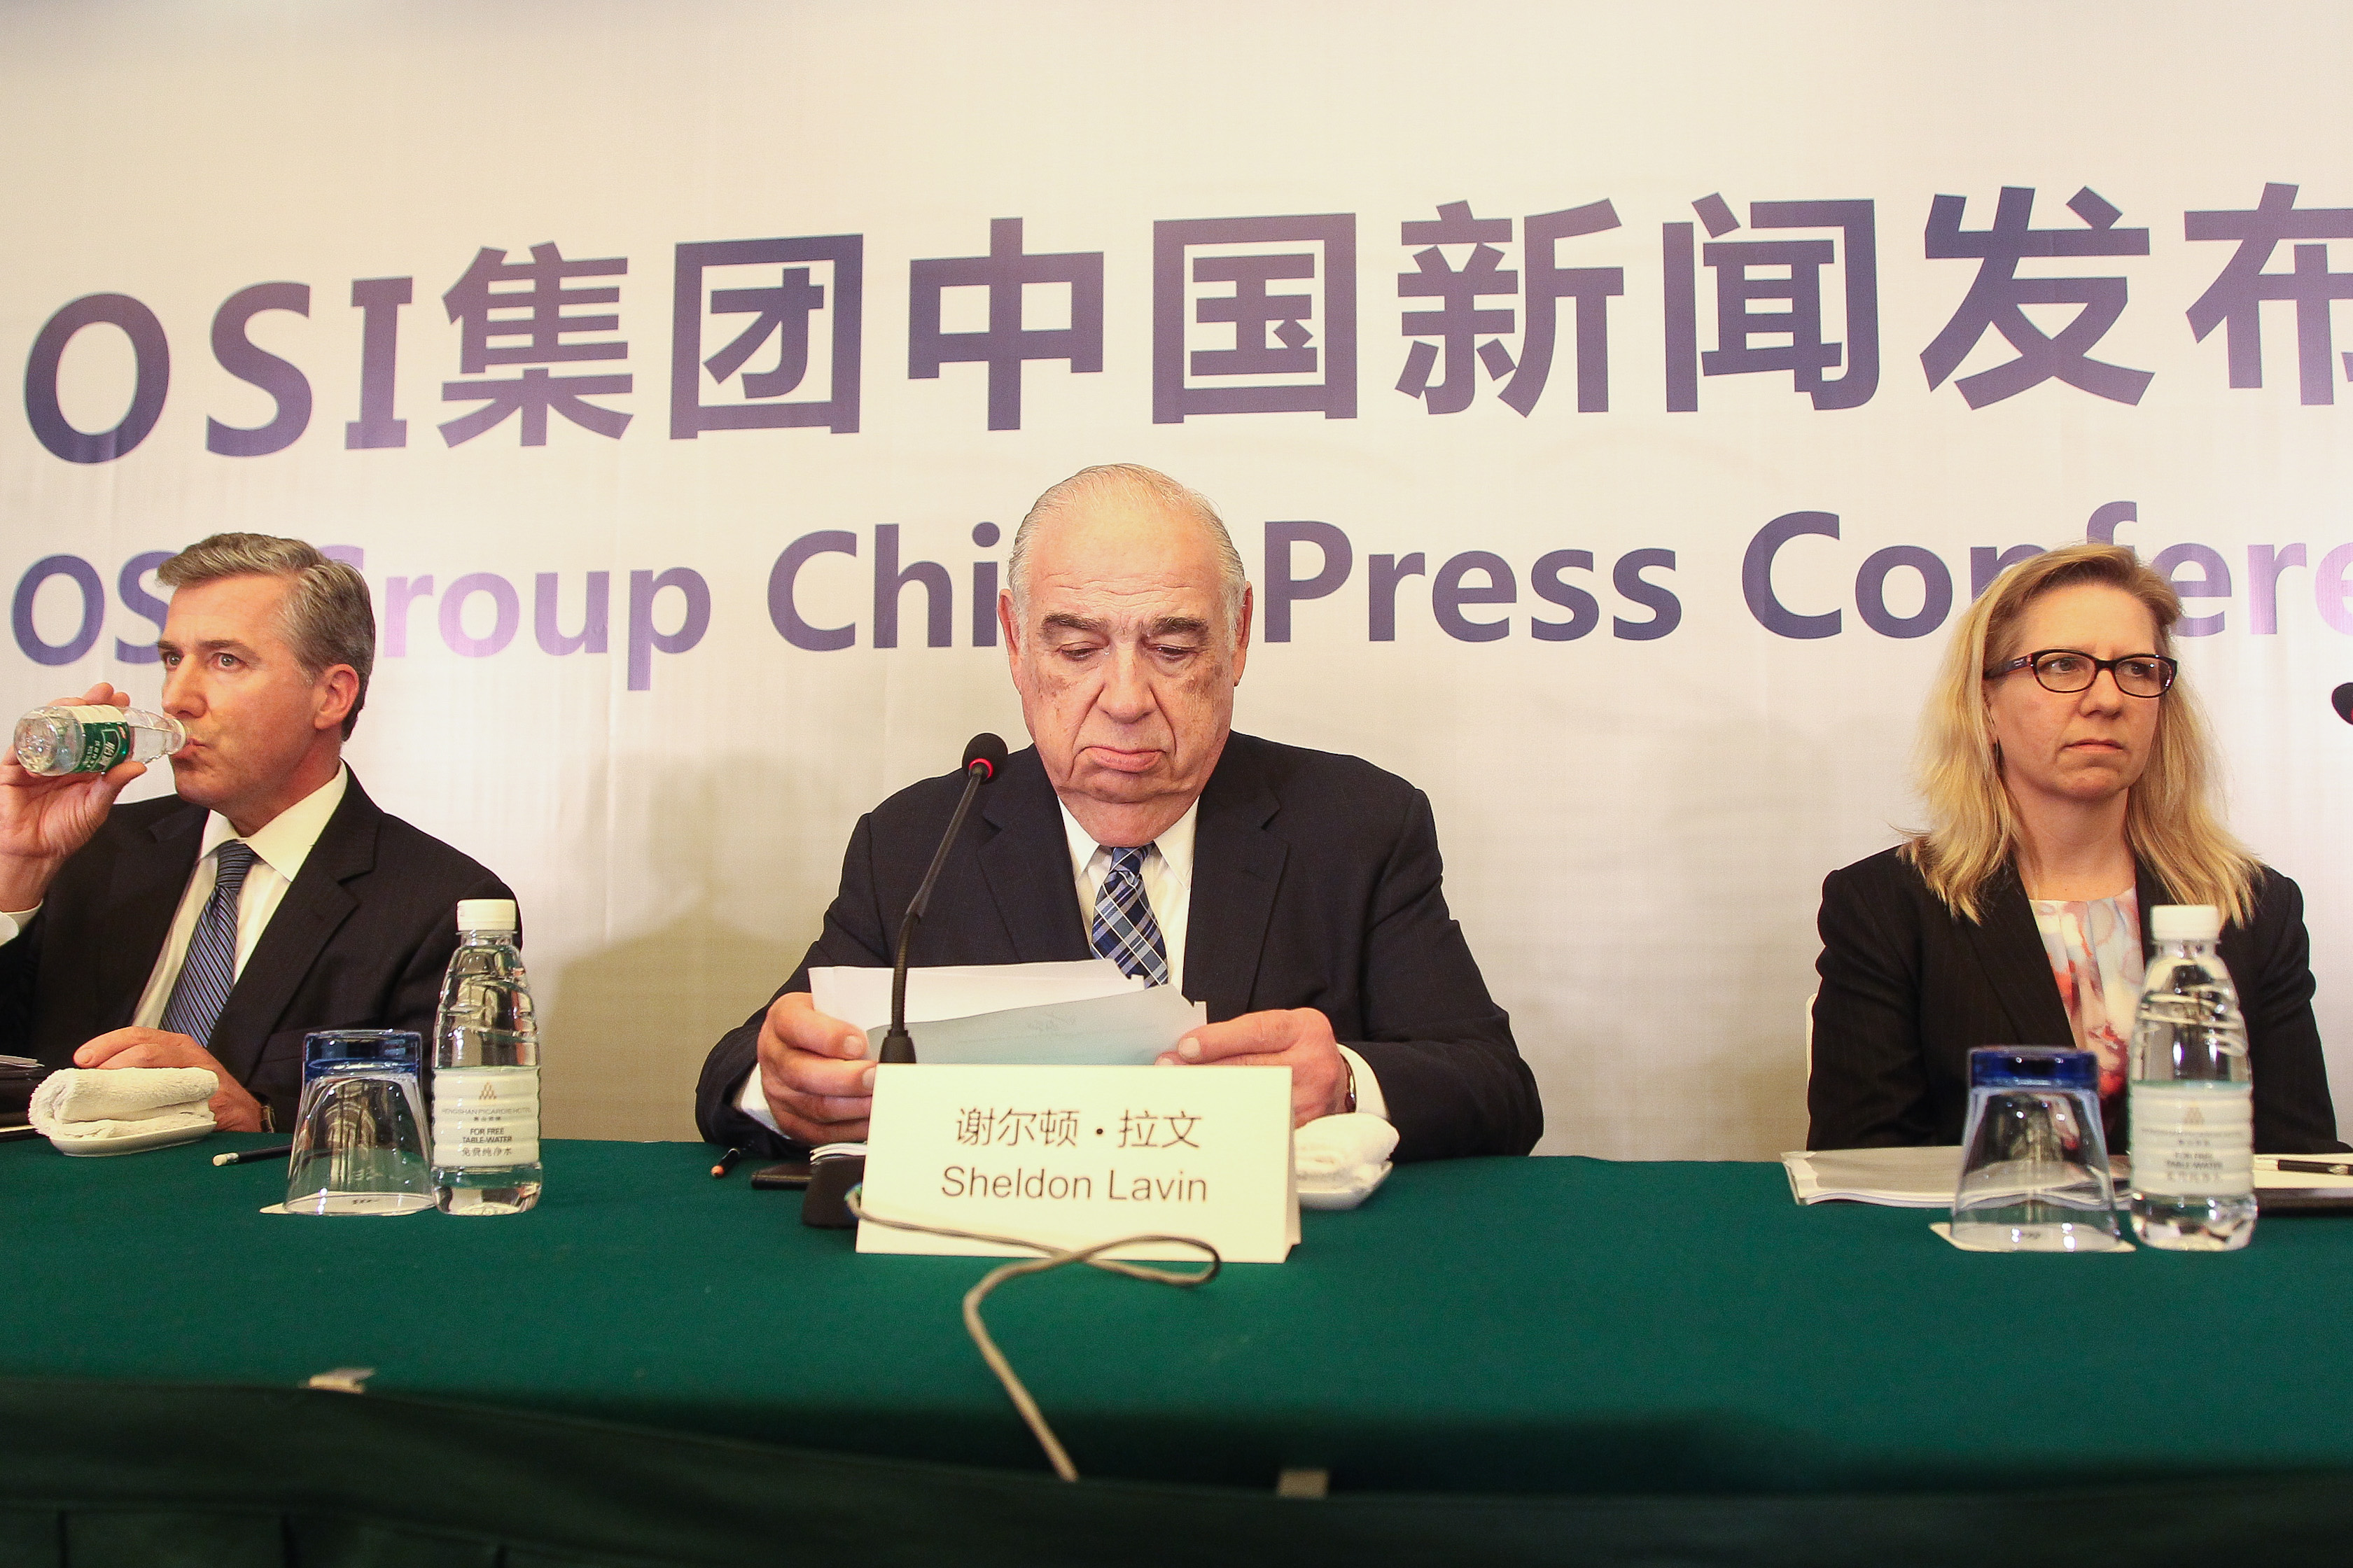 OSI Group China Press Conference